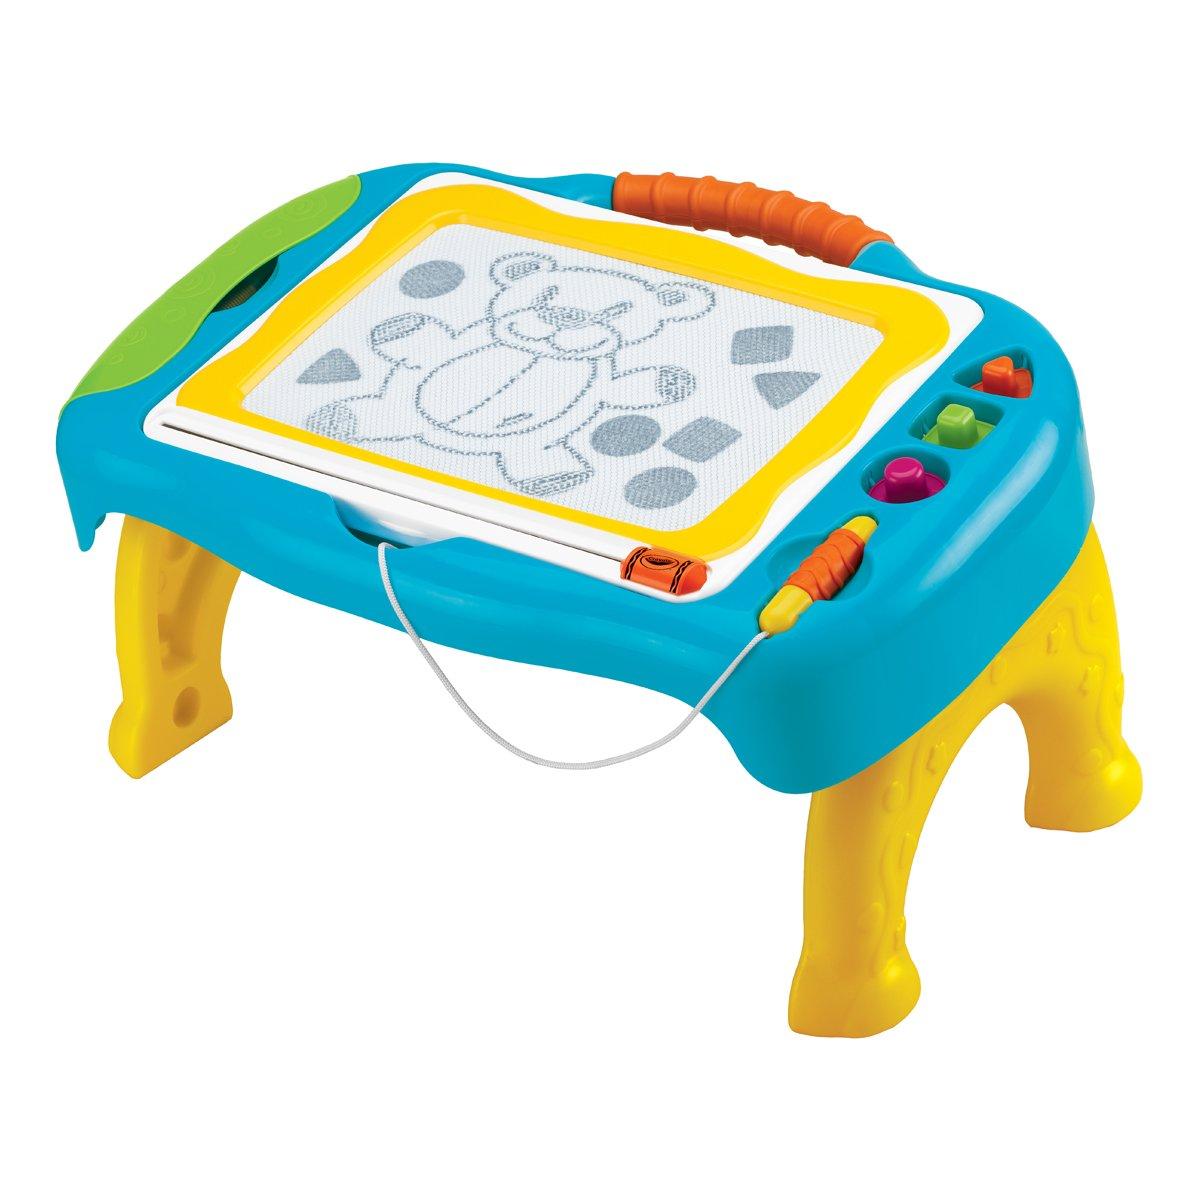 sc 1 st  Amazon.com & Amazon.com: Crayola Sit N Draw Travel Table: Toys u0026 Games islam-shia.org